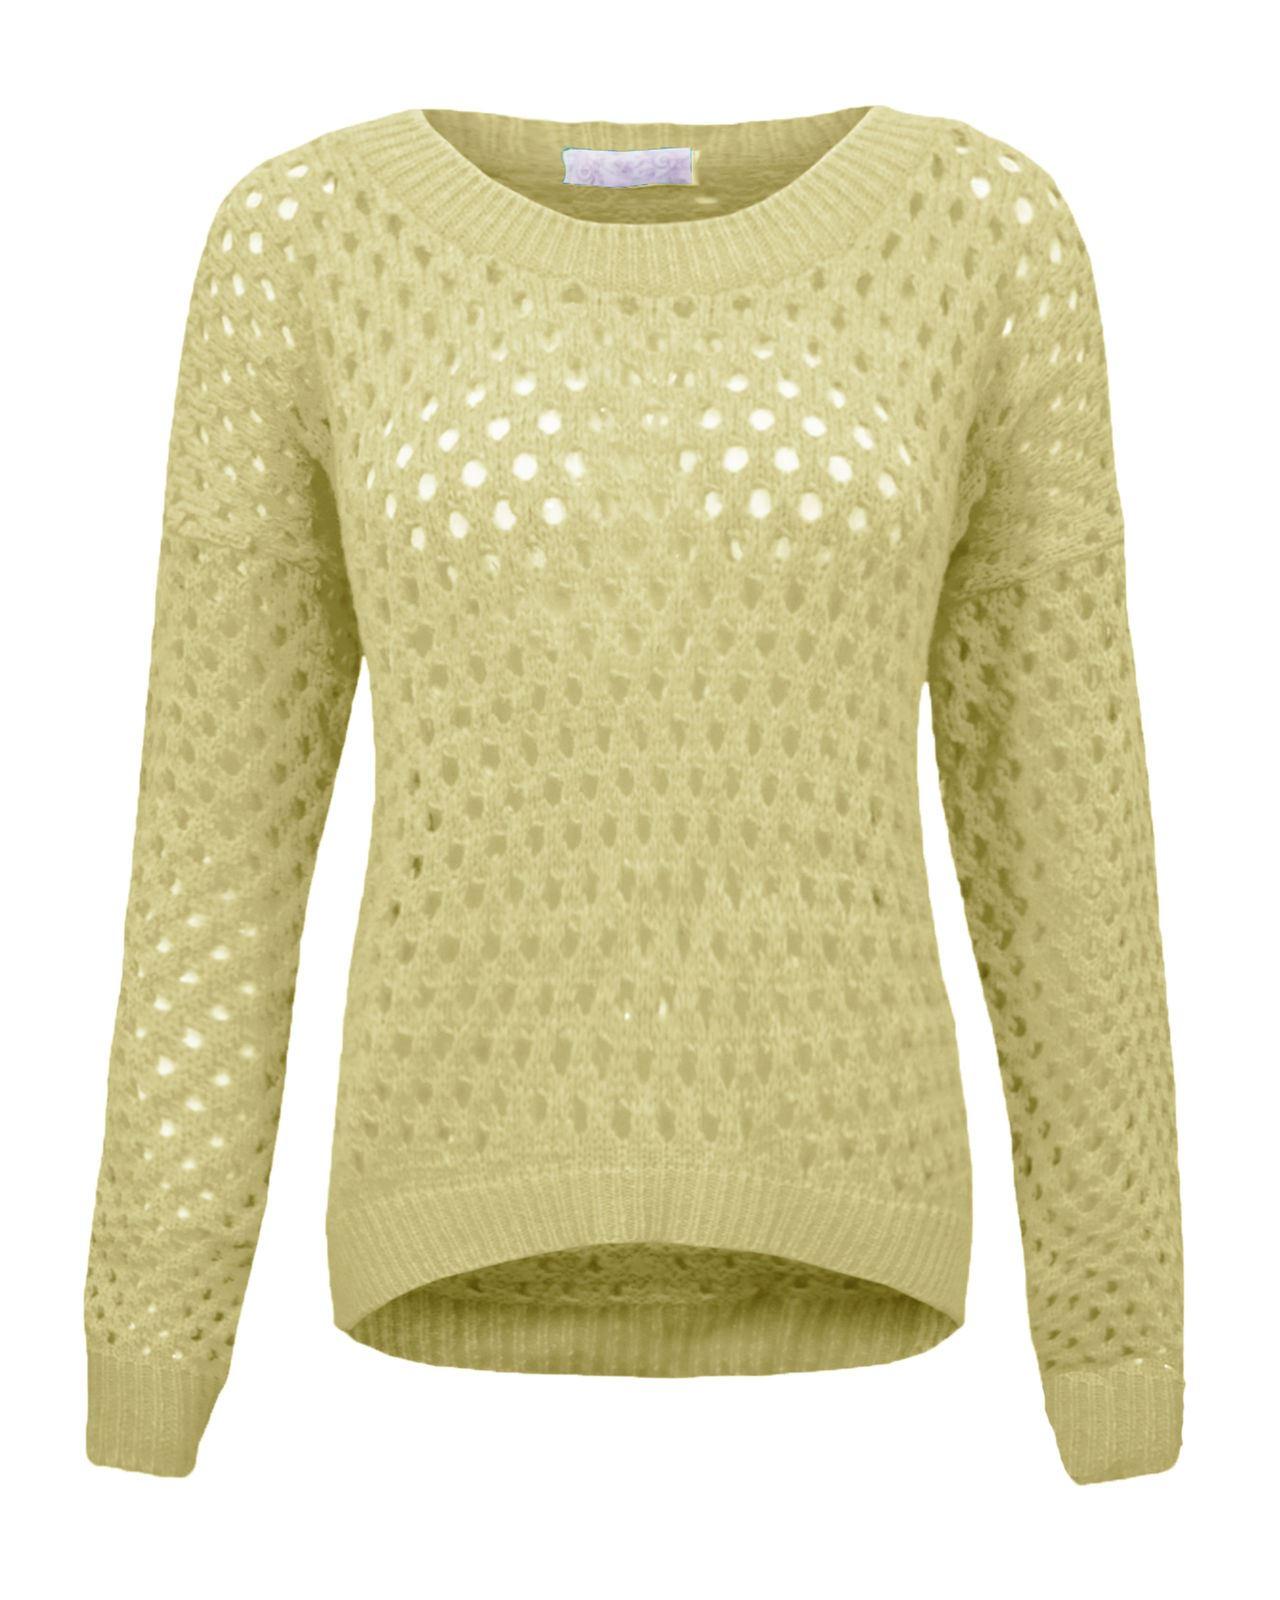 Knitting Pattern Plain Jumper : LADIES WOMENS SOFT HOLEY KNITTED CROCHET PLAIN JUMPER STRETCH SWEATER TOP 8-1...